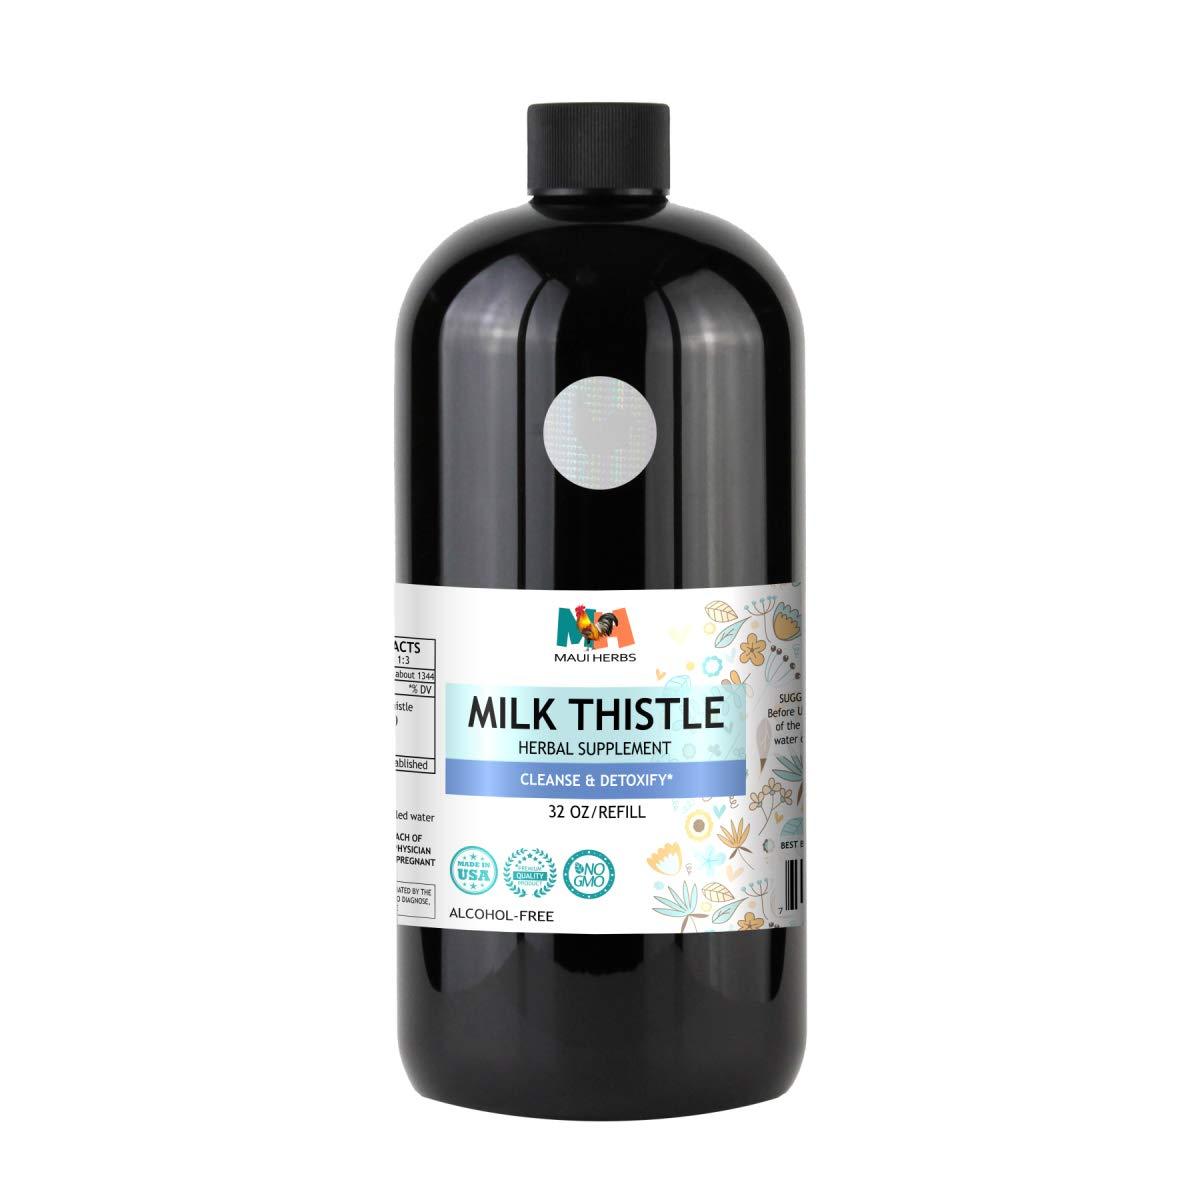 Milk Thistle Tincture Alcohol-Free Liquid Extract, Organic Milk Thistle Seed (Silybum marianum) (32 FL OZ)